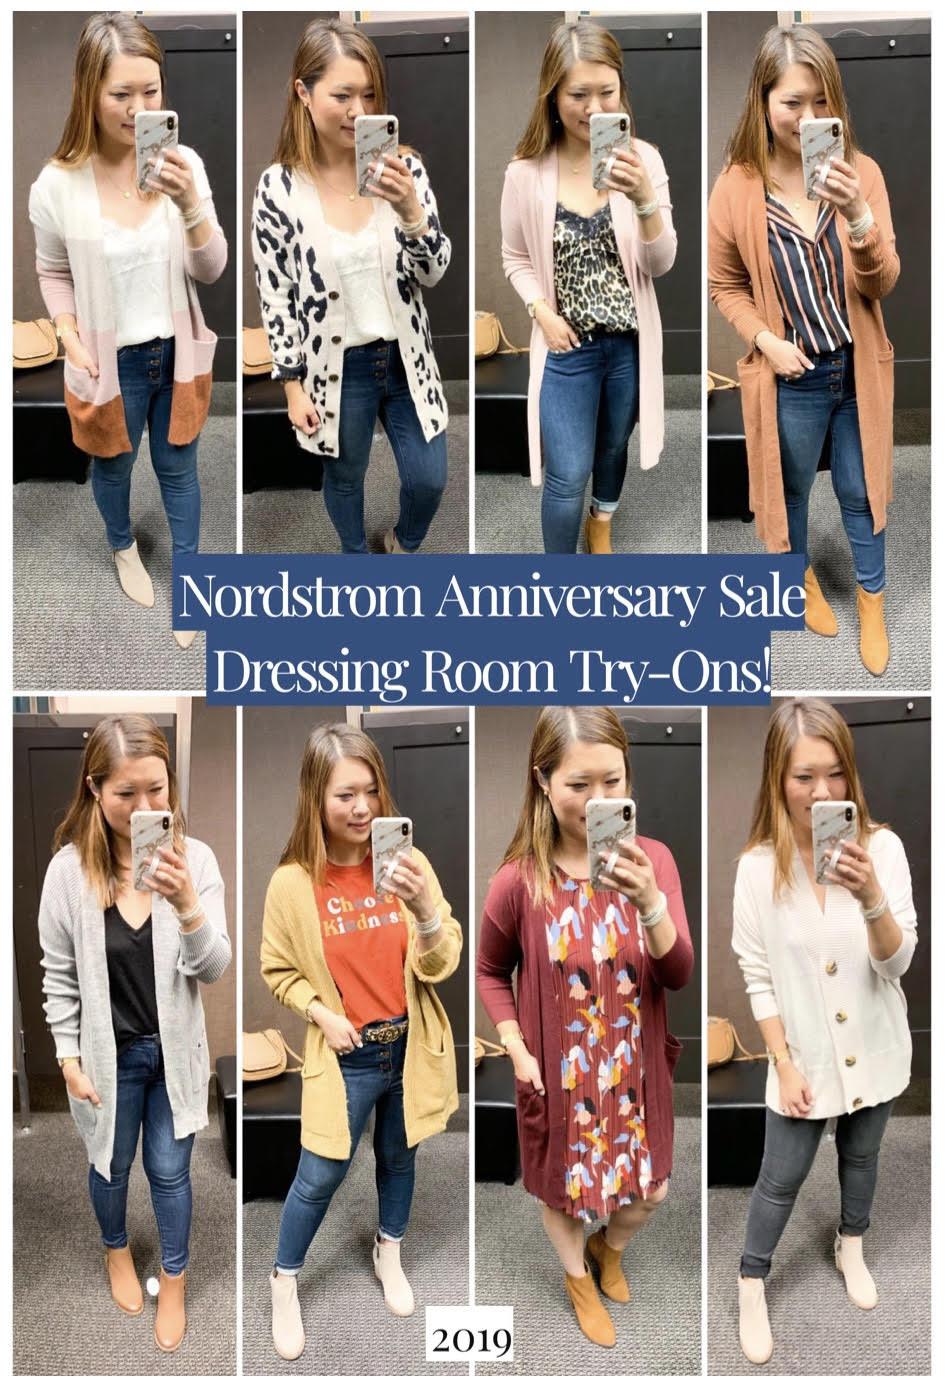 fd4716ae3 Nordstrom Anniversary Sale 2019 - Women's Fashion Dressing Room Try ...